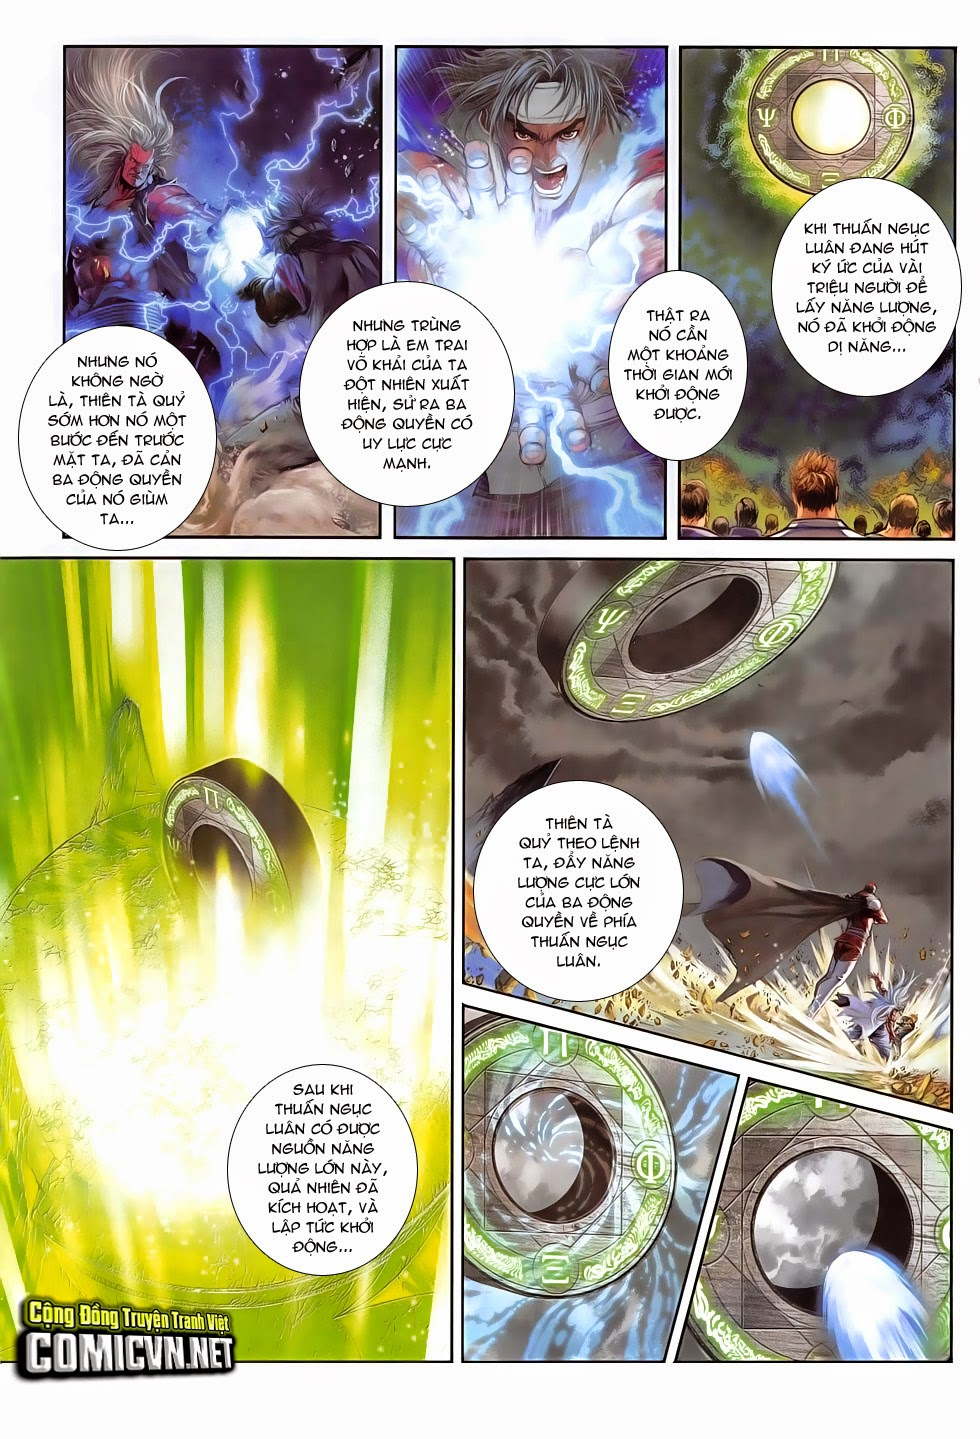 Ba Động Quyền Z Hadouken Zero chap 15 - Trang 3